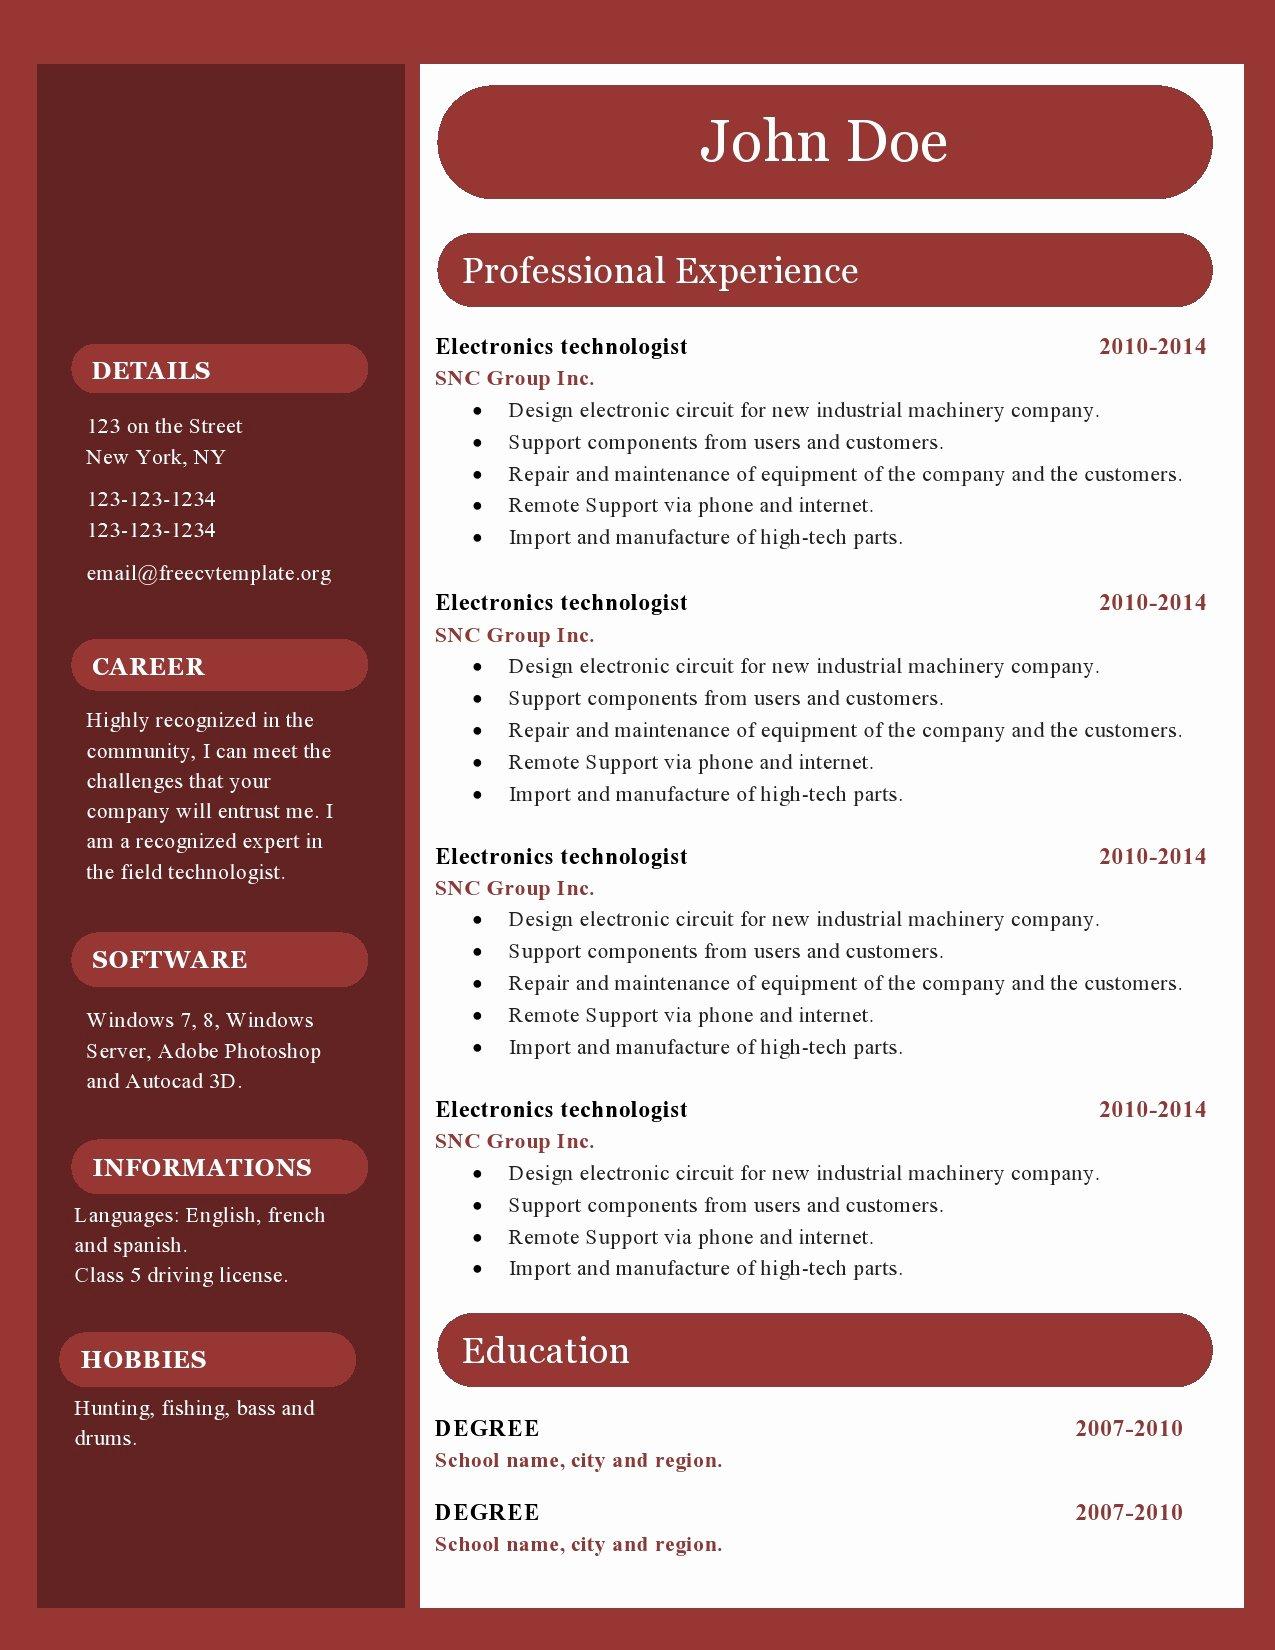 Free Cv Resume Templates 417 to 422 – Free Cv Template